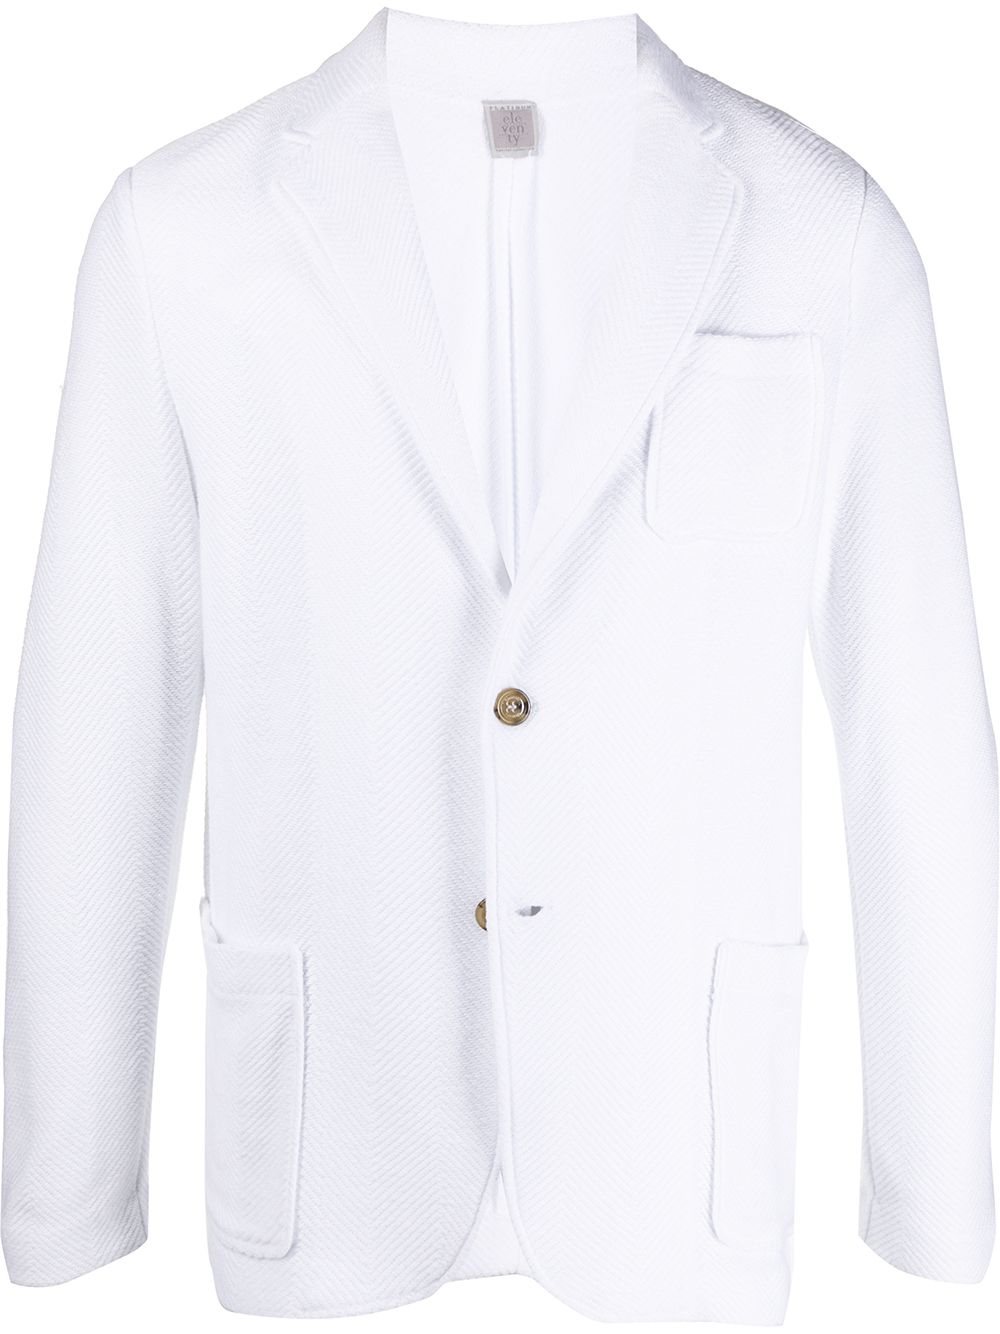 giacca classsica in cotone bianco ELEVENTY | Giacche | A76MAGA68-MAG0A06501